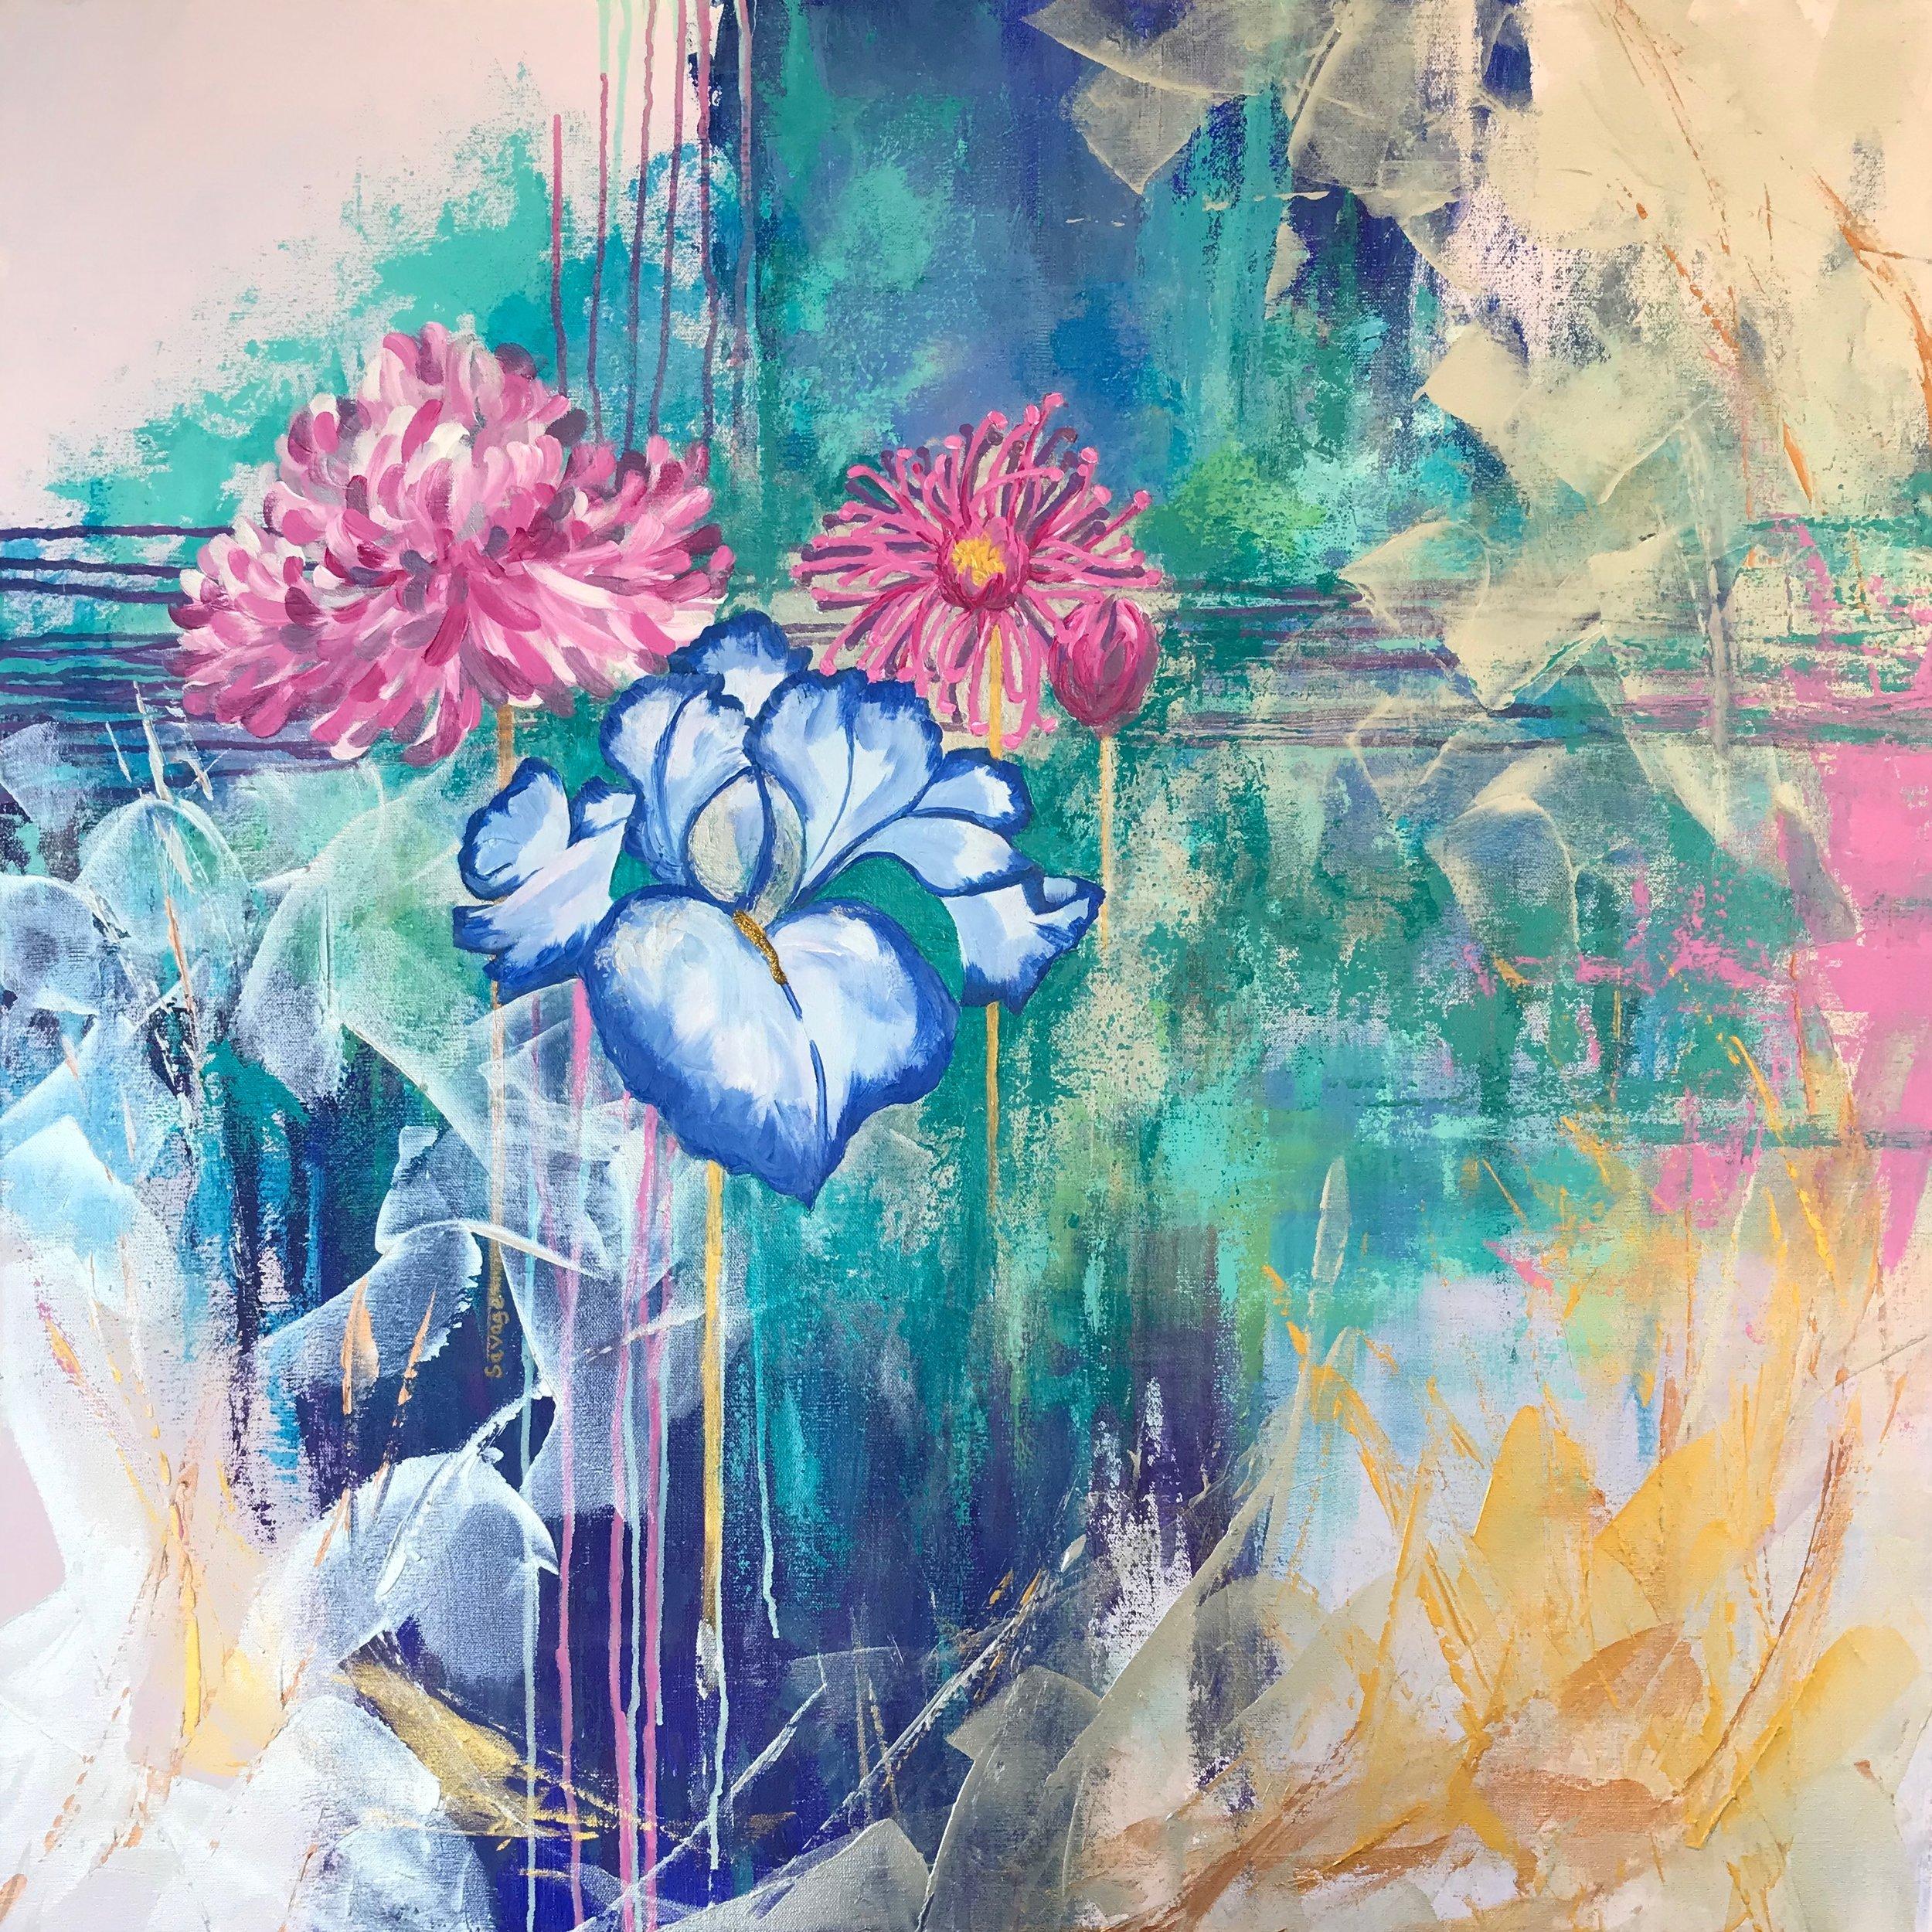 Peony & Iris, 36x36, acrylic on canvas, $2450